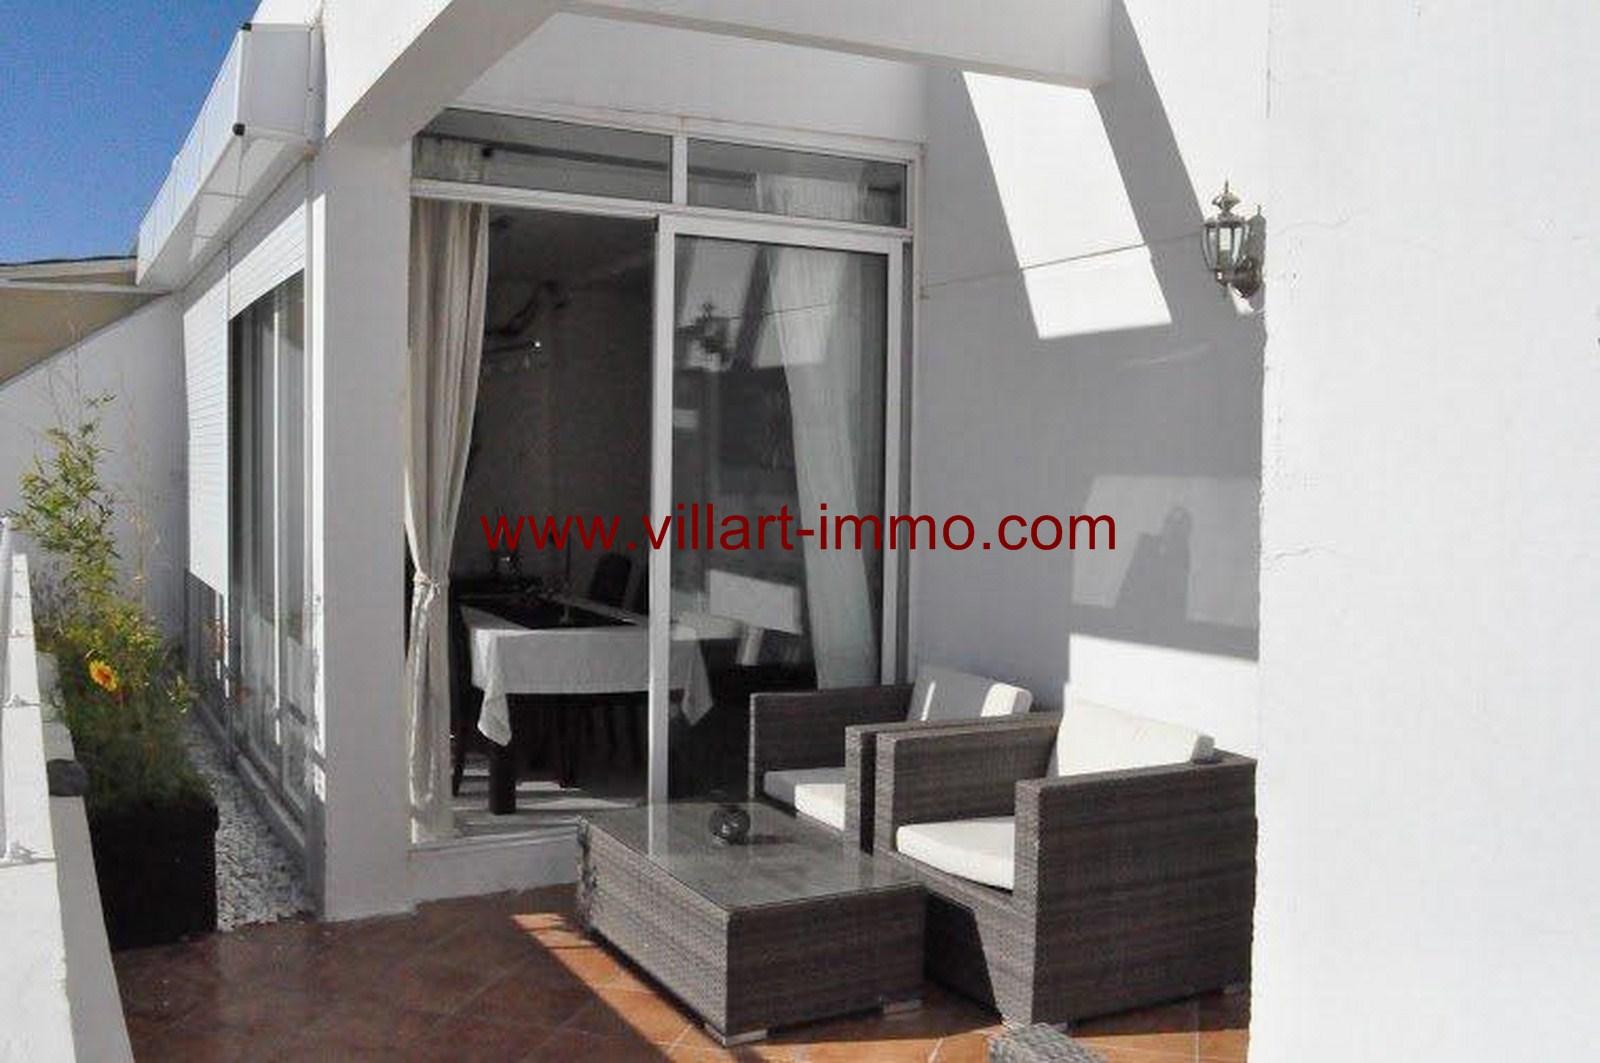 9-vente-appartement-tanger-route-de-rabat-terrasse-va383-villart-immo